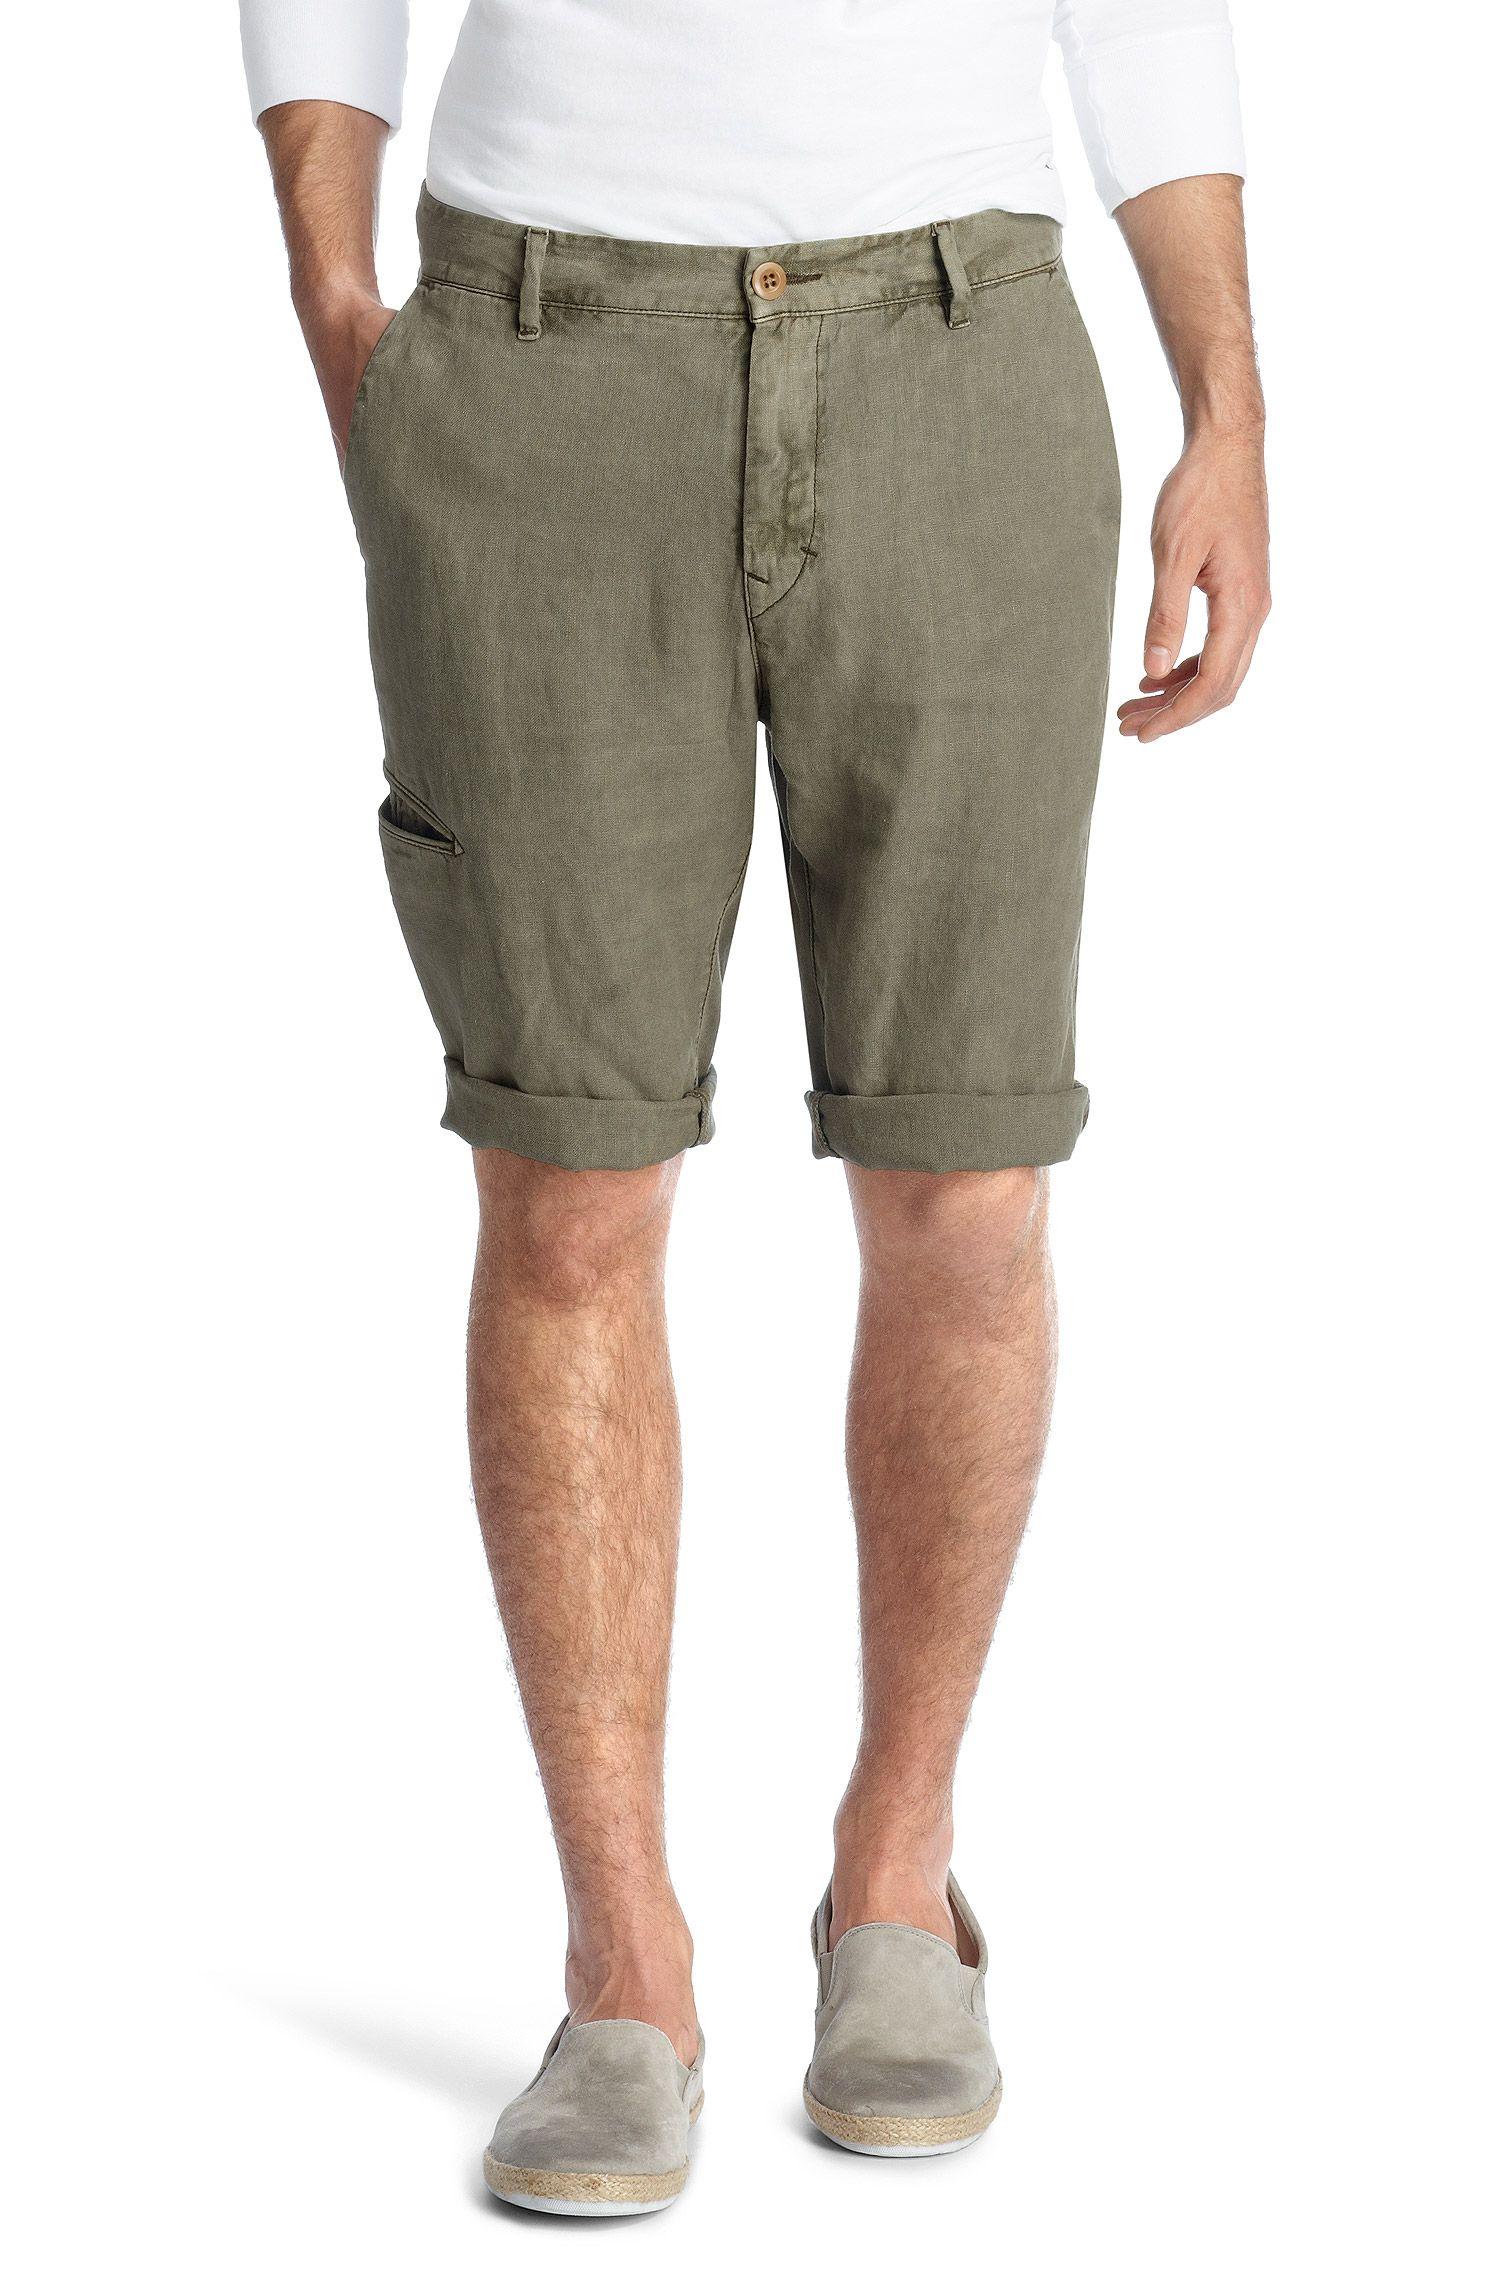 Bermuda 'Stimo-Shorts-D' van zuiver linnen